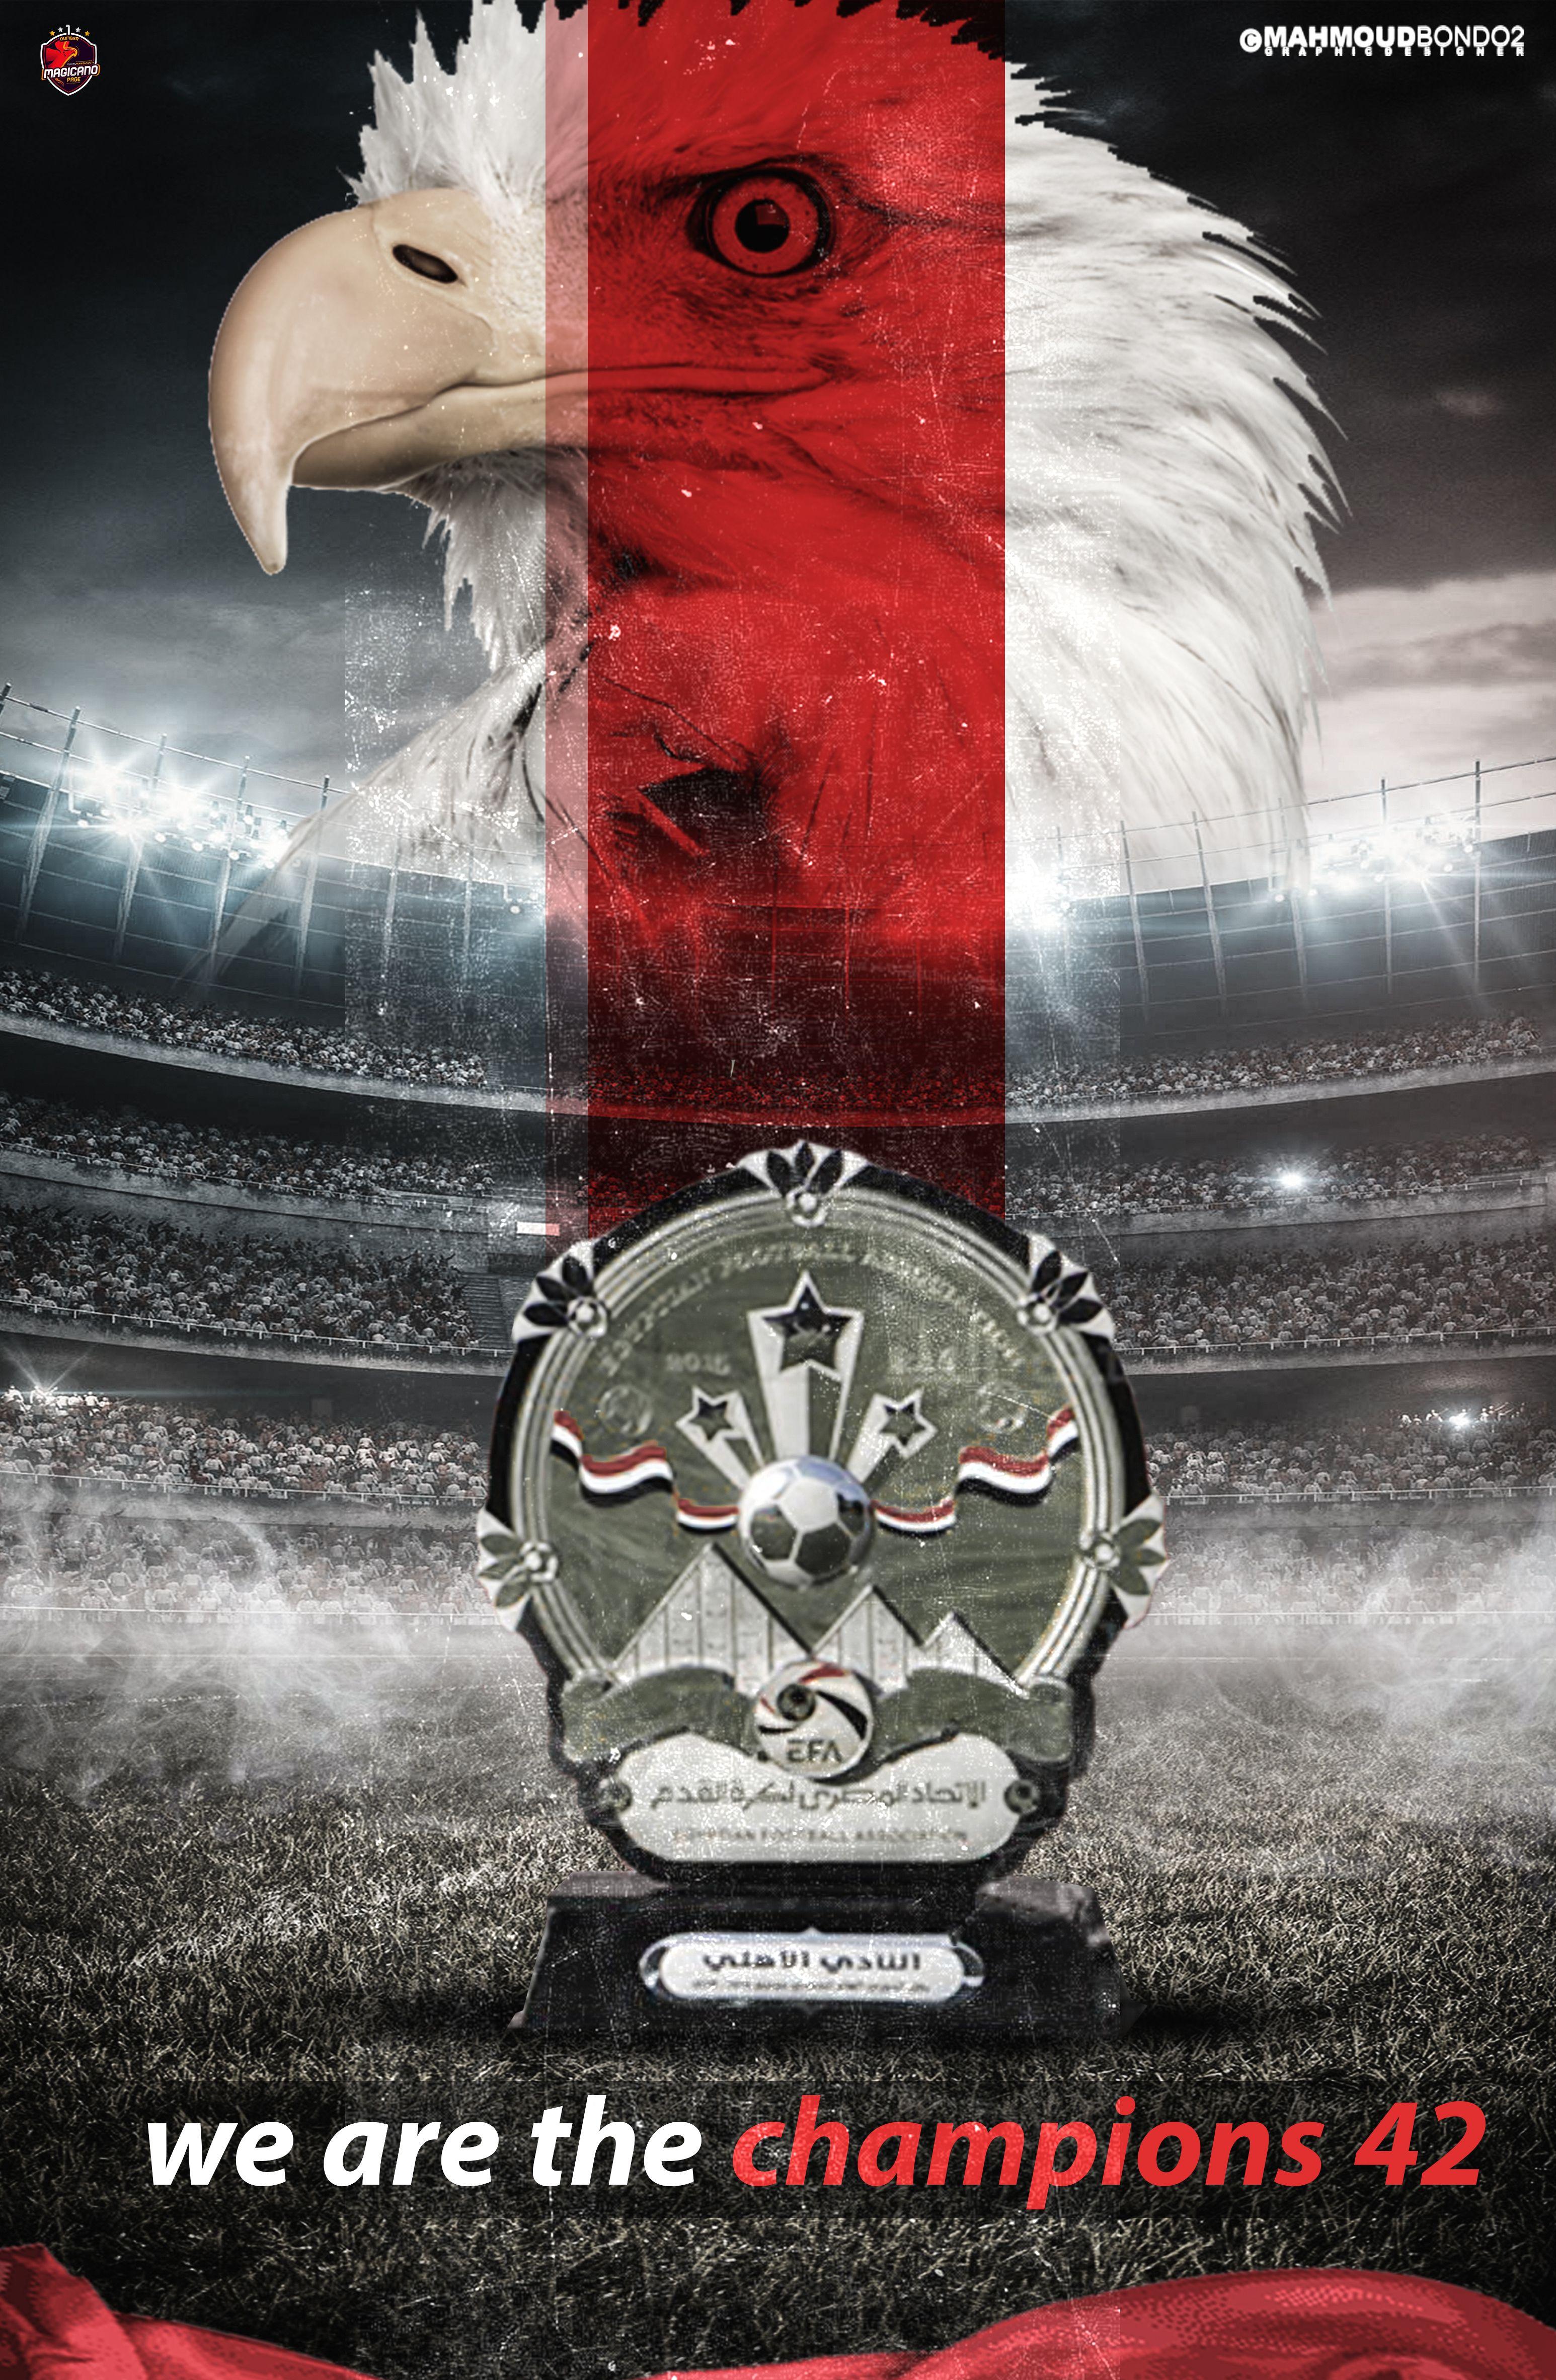 Al Ahly Egyptian League Champions 2020 الأهلي أبطال الدوري المصر 42 We Are The Champions Egyptian Art